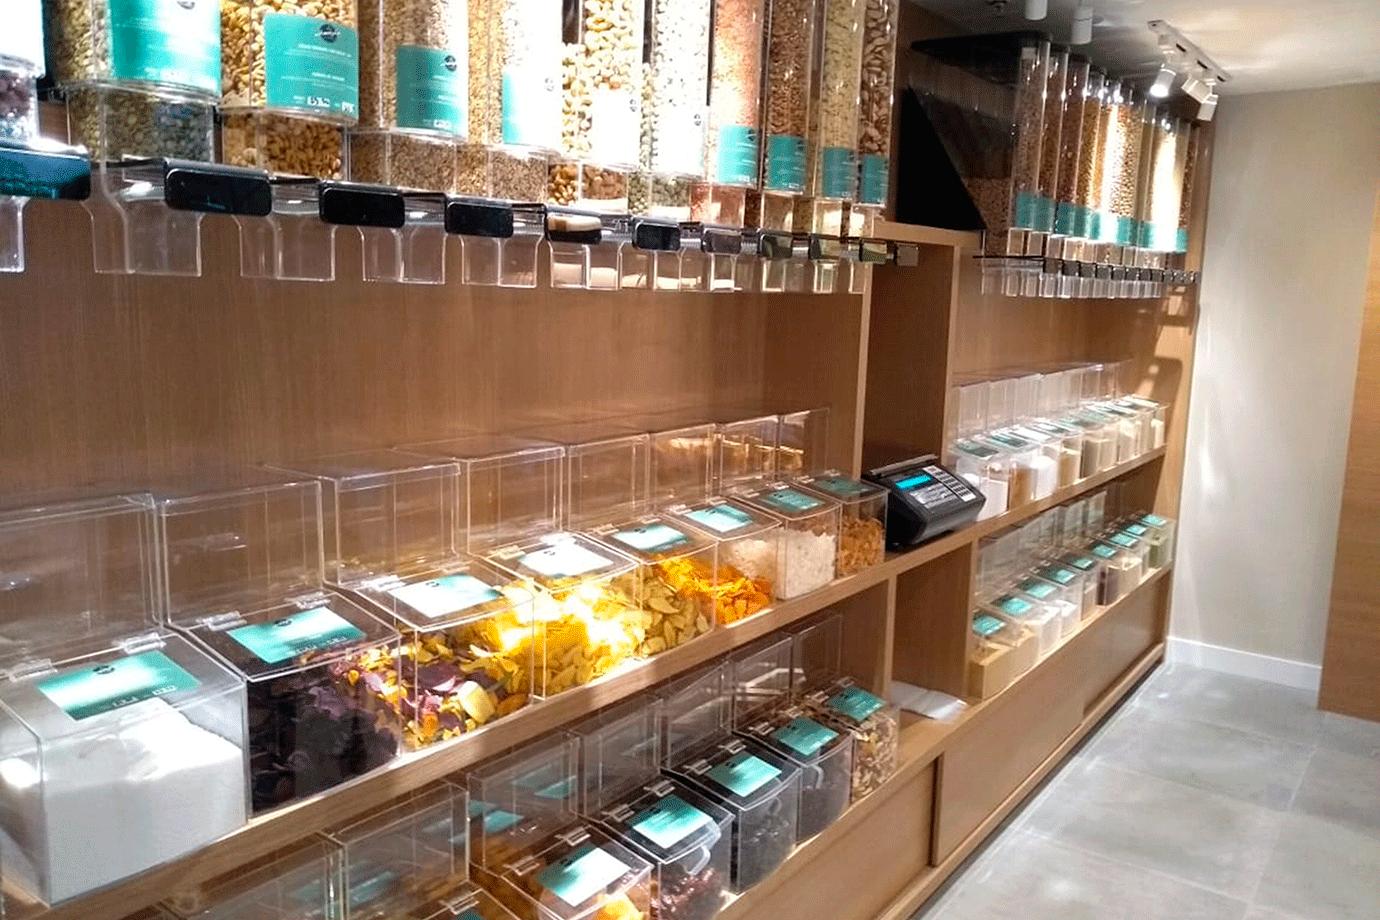 Armazém Fit Store